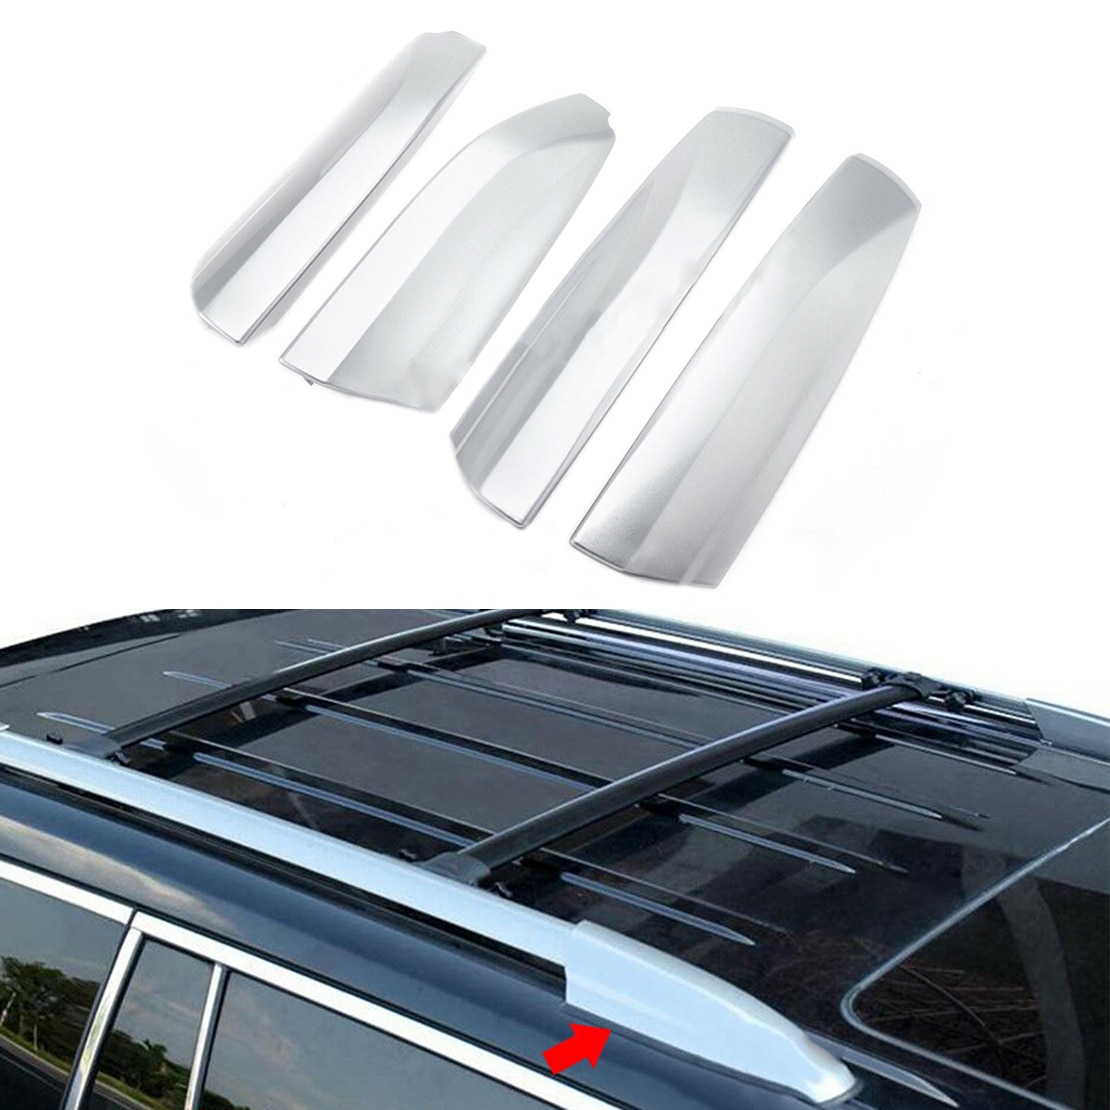 Coche 4 Uds plata techo final cubierta carcasa para Toyota Highlander XU40 2008, 2009, 2010, 2011, 2012, 2013